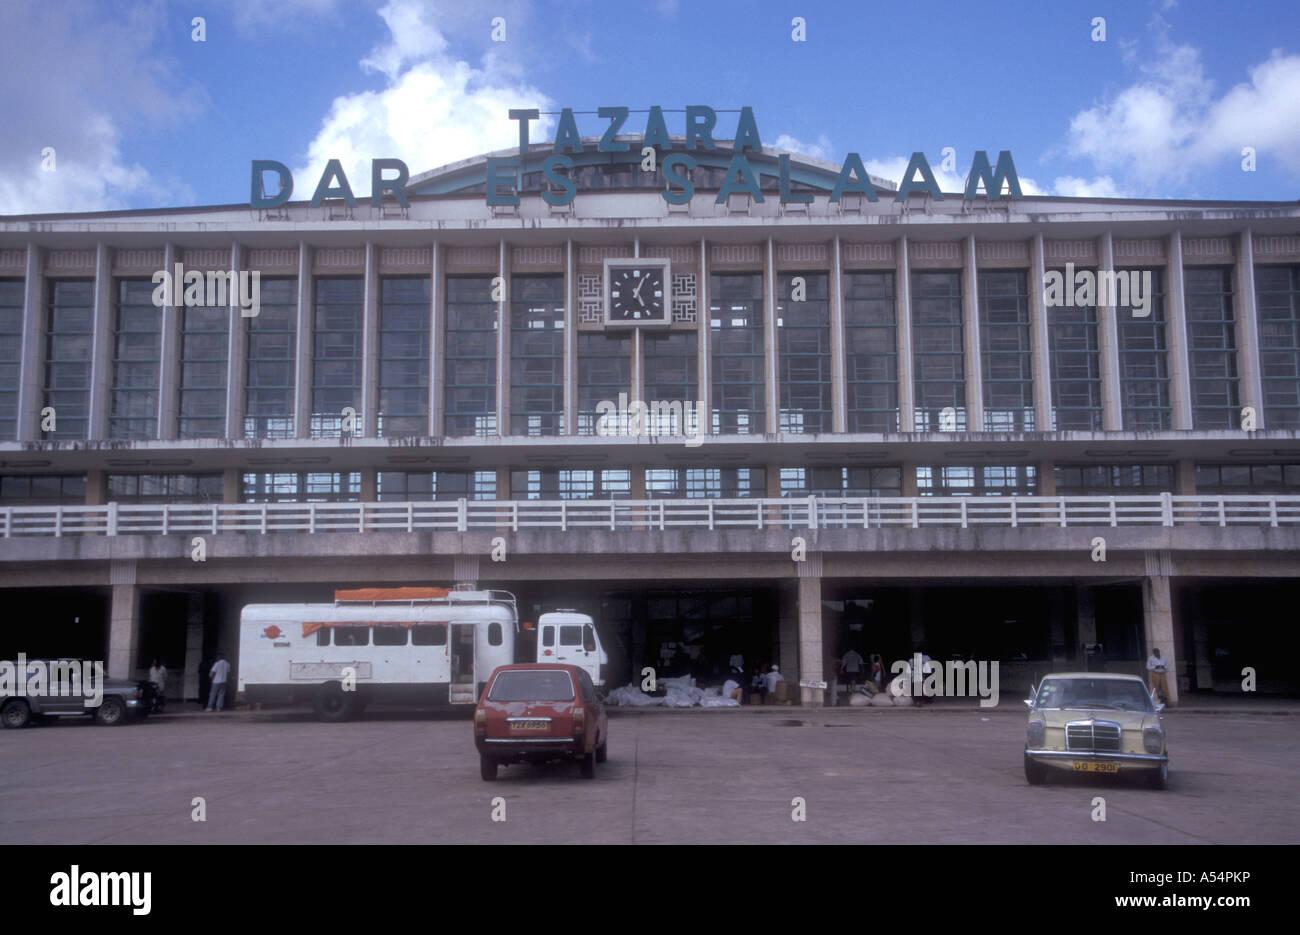 Tazara International Airport Dar es Salaam Tanzania East Africa - Stock Image